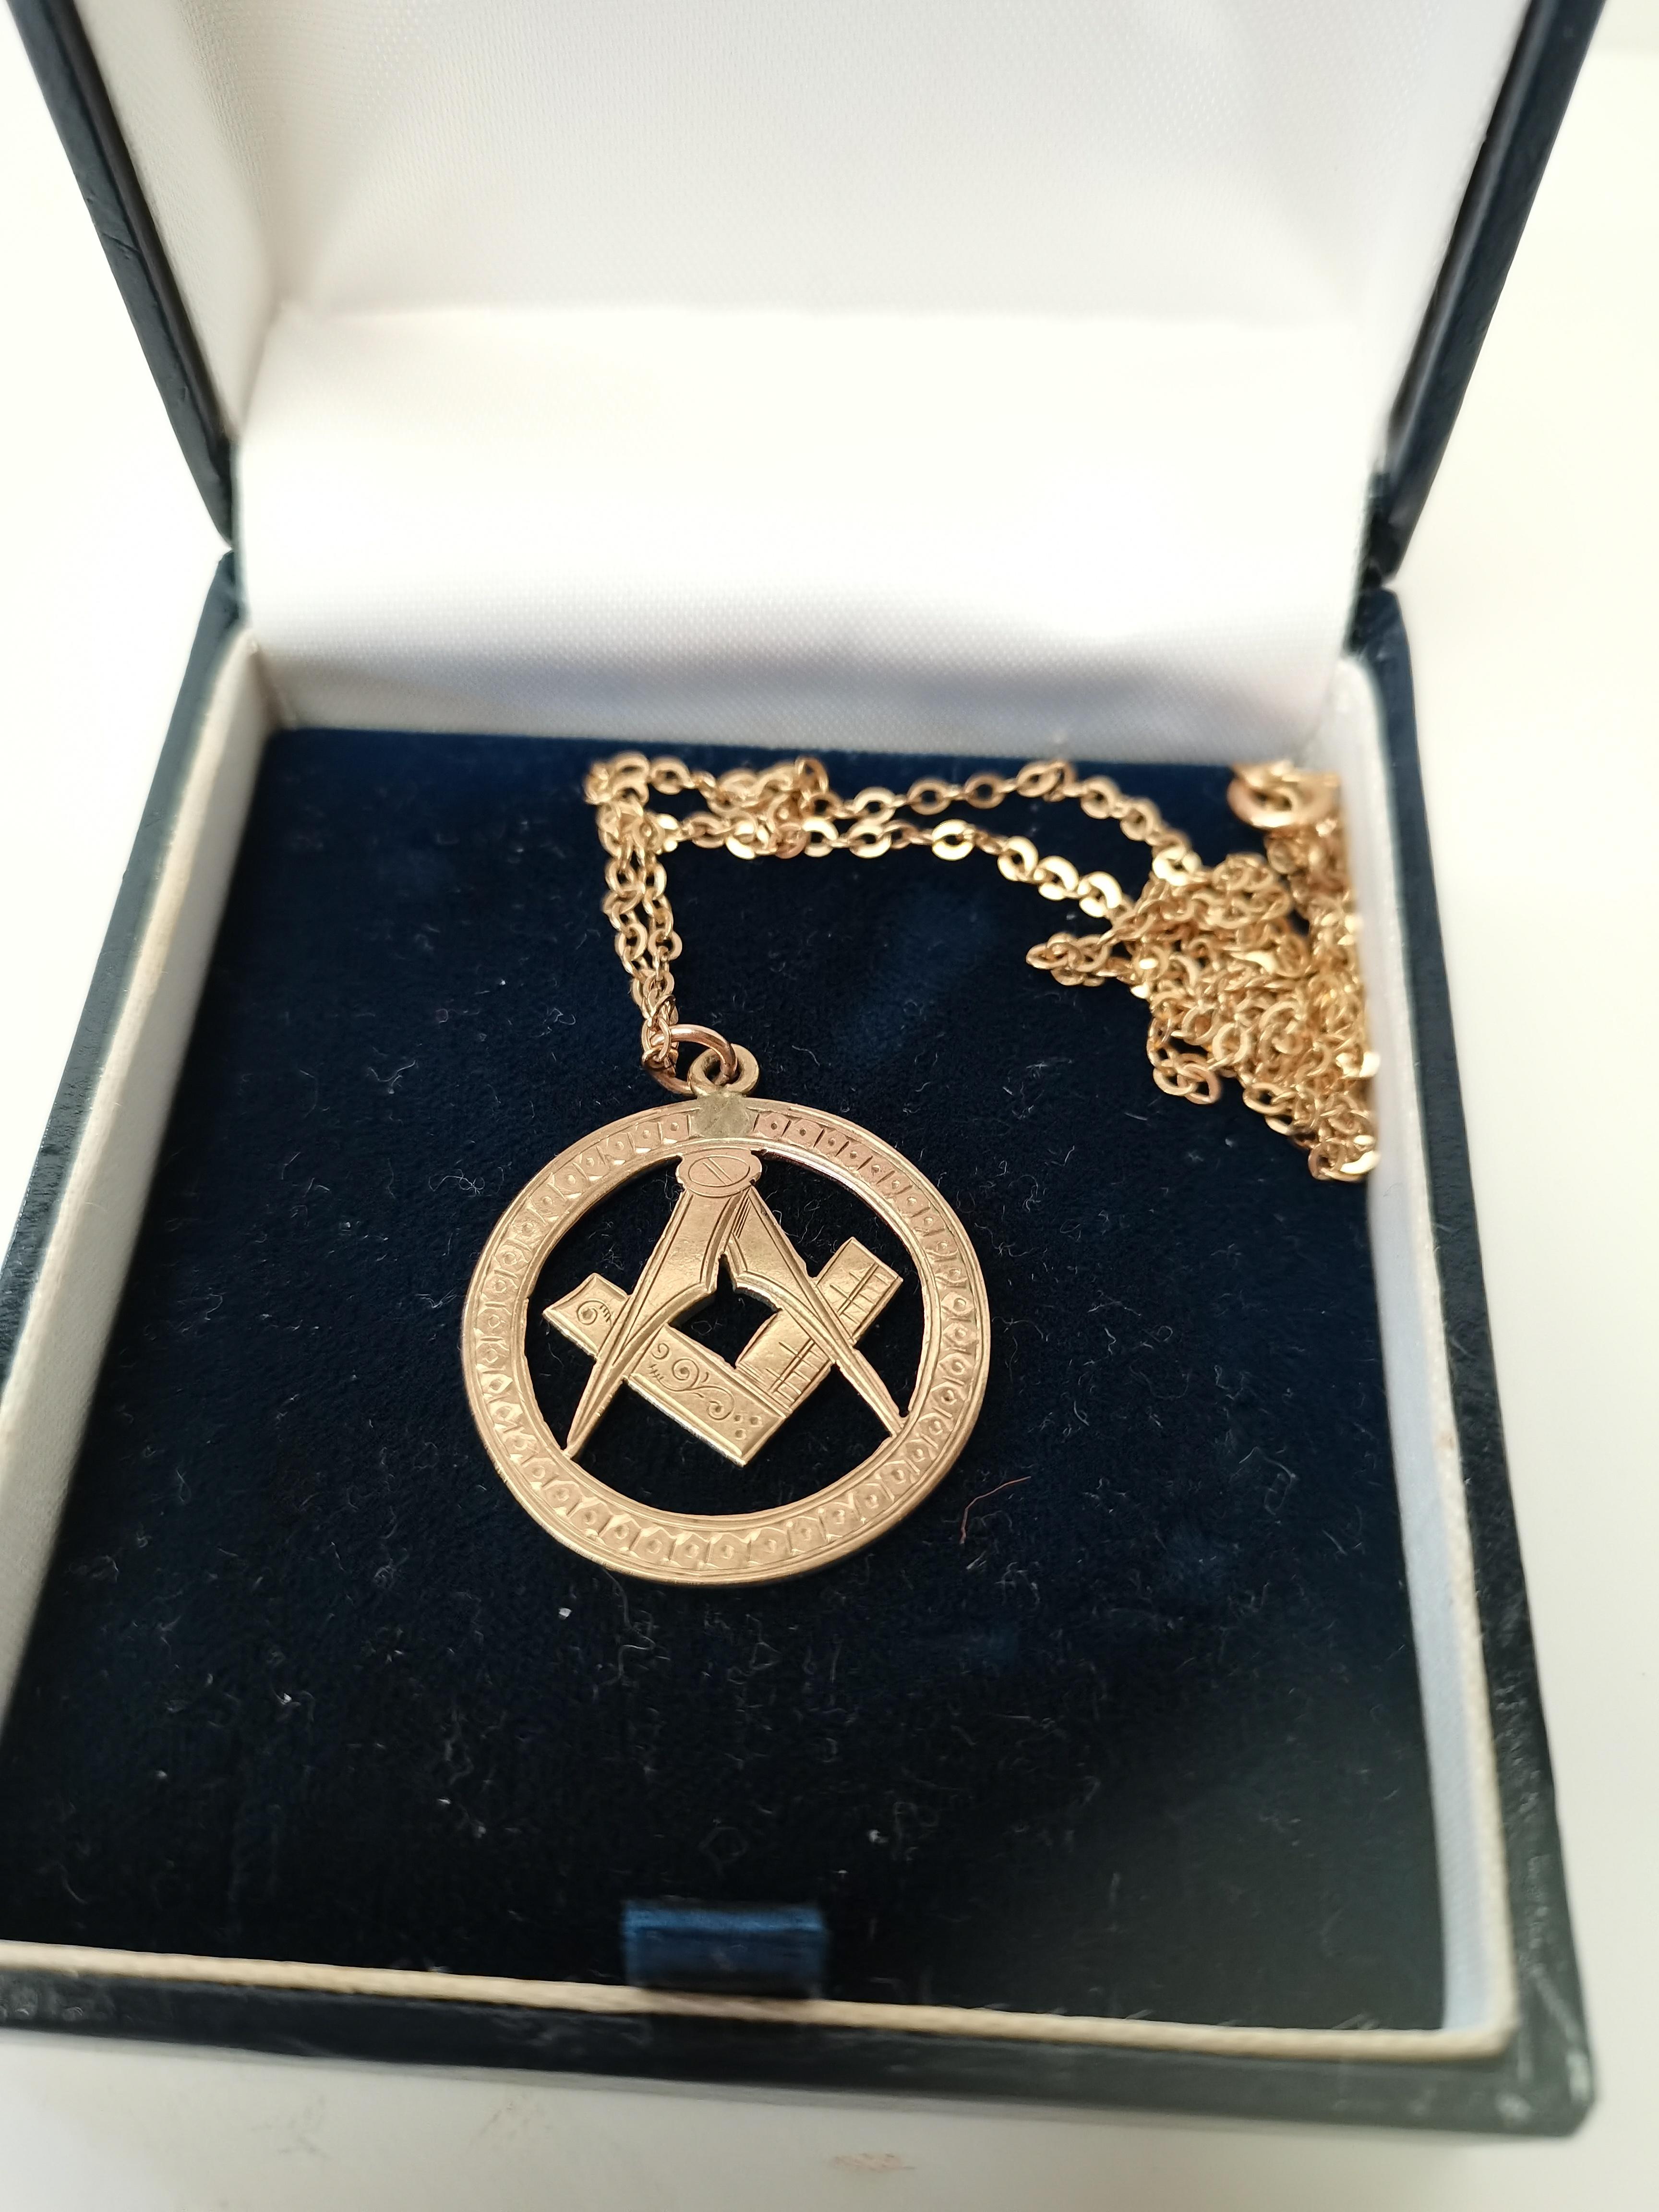 Gold masonic pendant on chain 5g